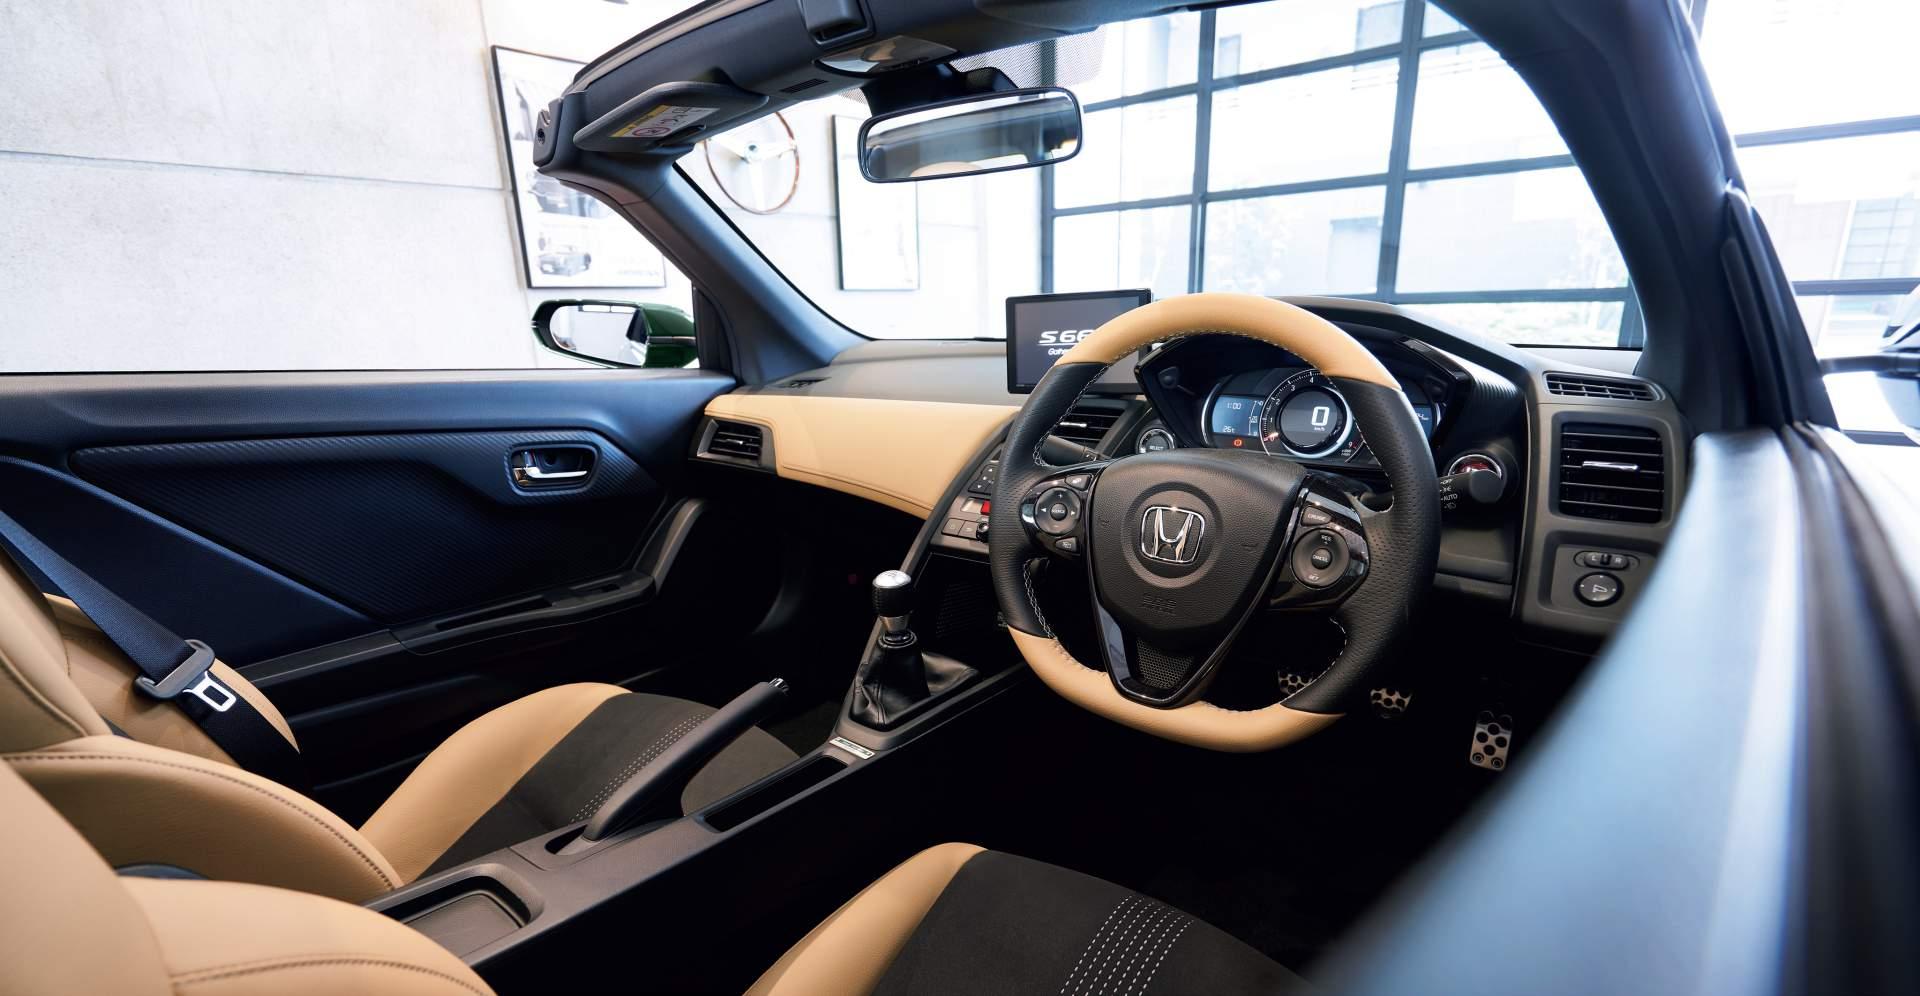 Honda_S660_Trad_Leather_Edition_0007